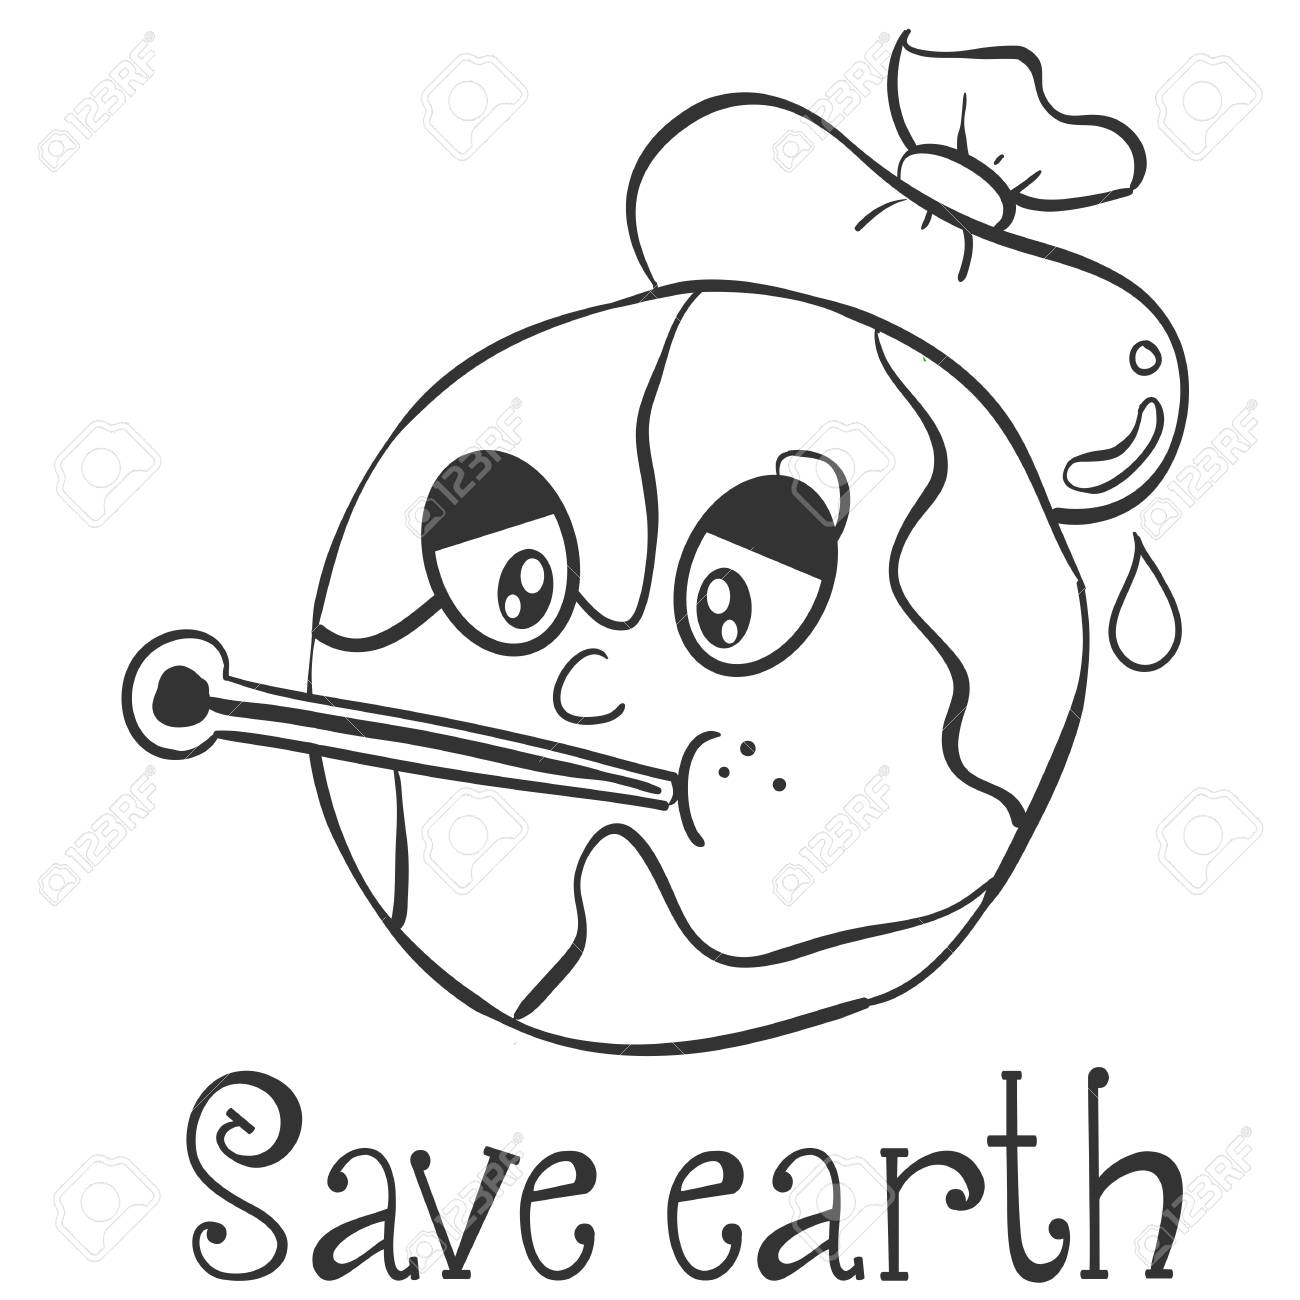 Hand draw save earth design